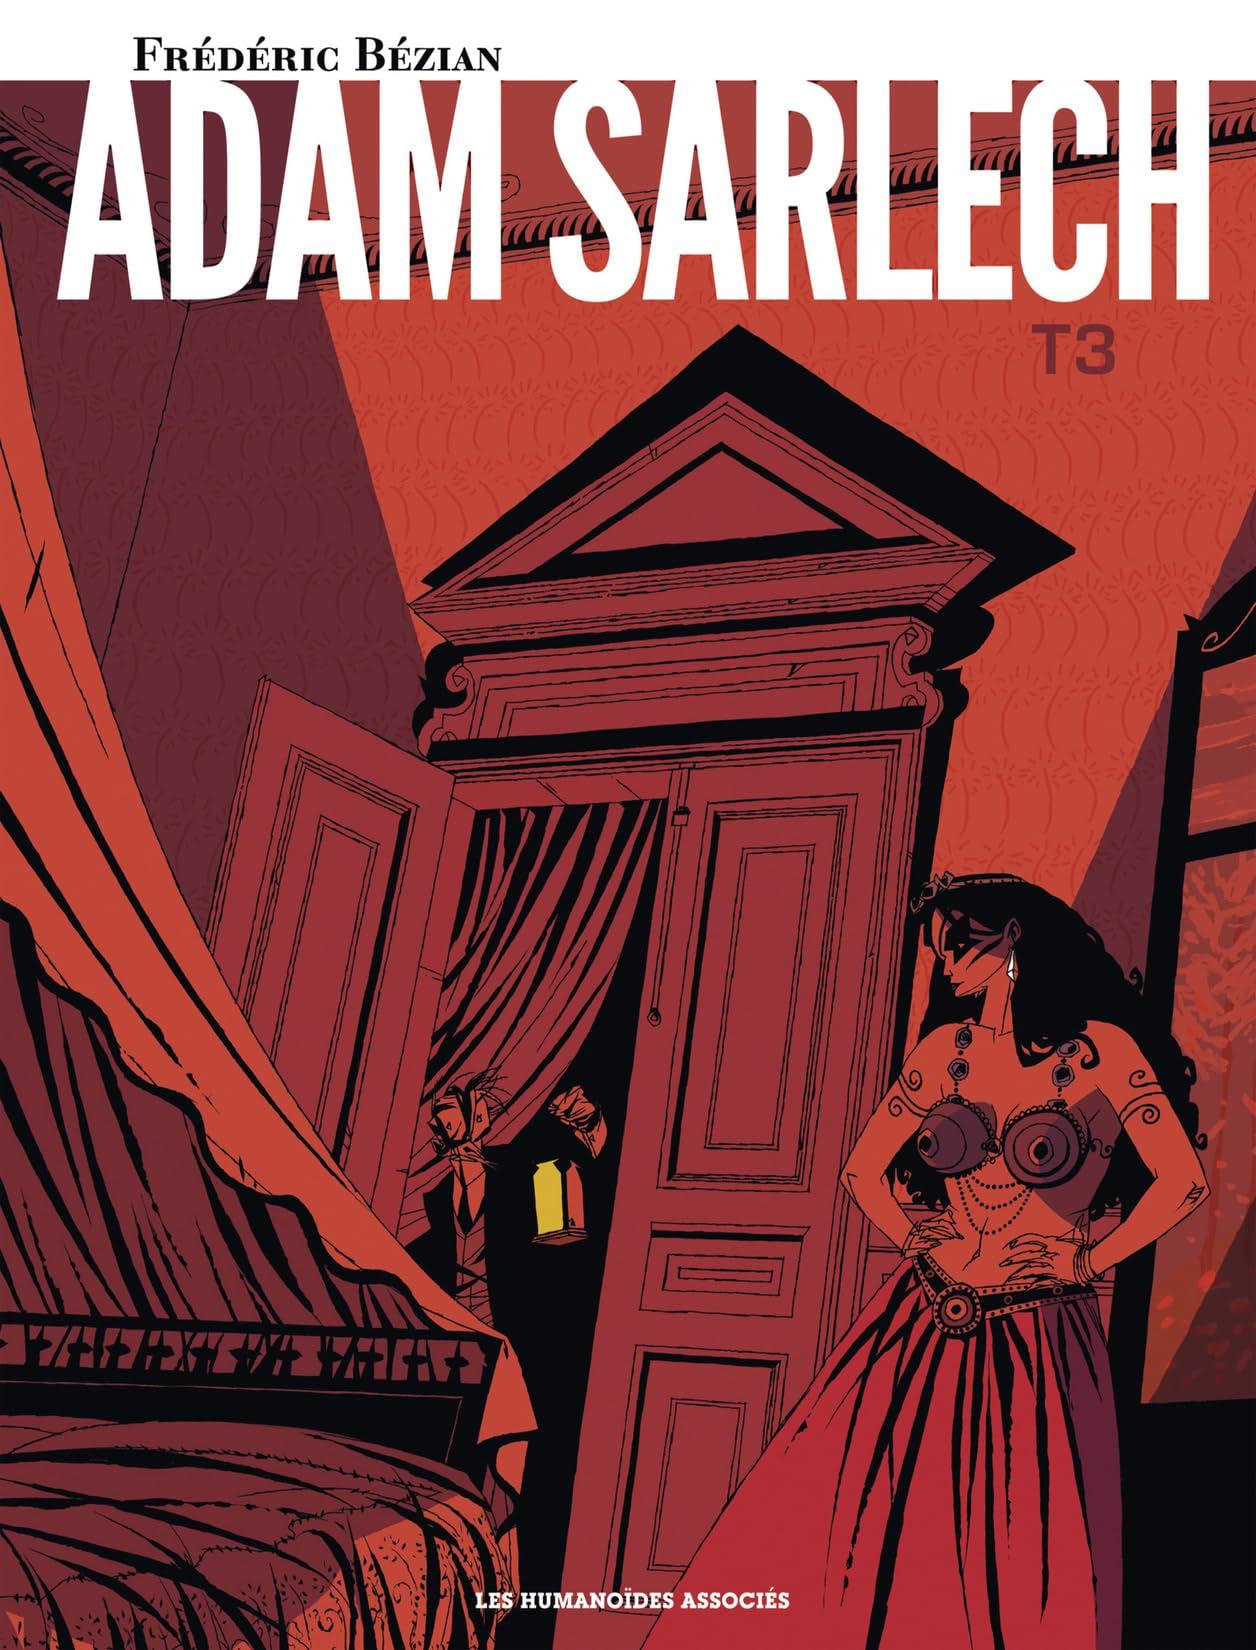 Adam Sarlech Vol. 3: Testament sous la neige